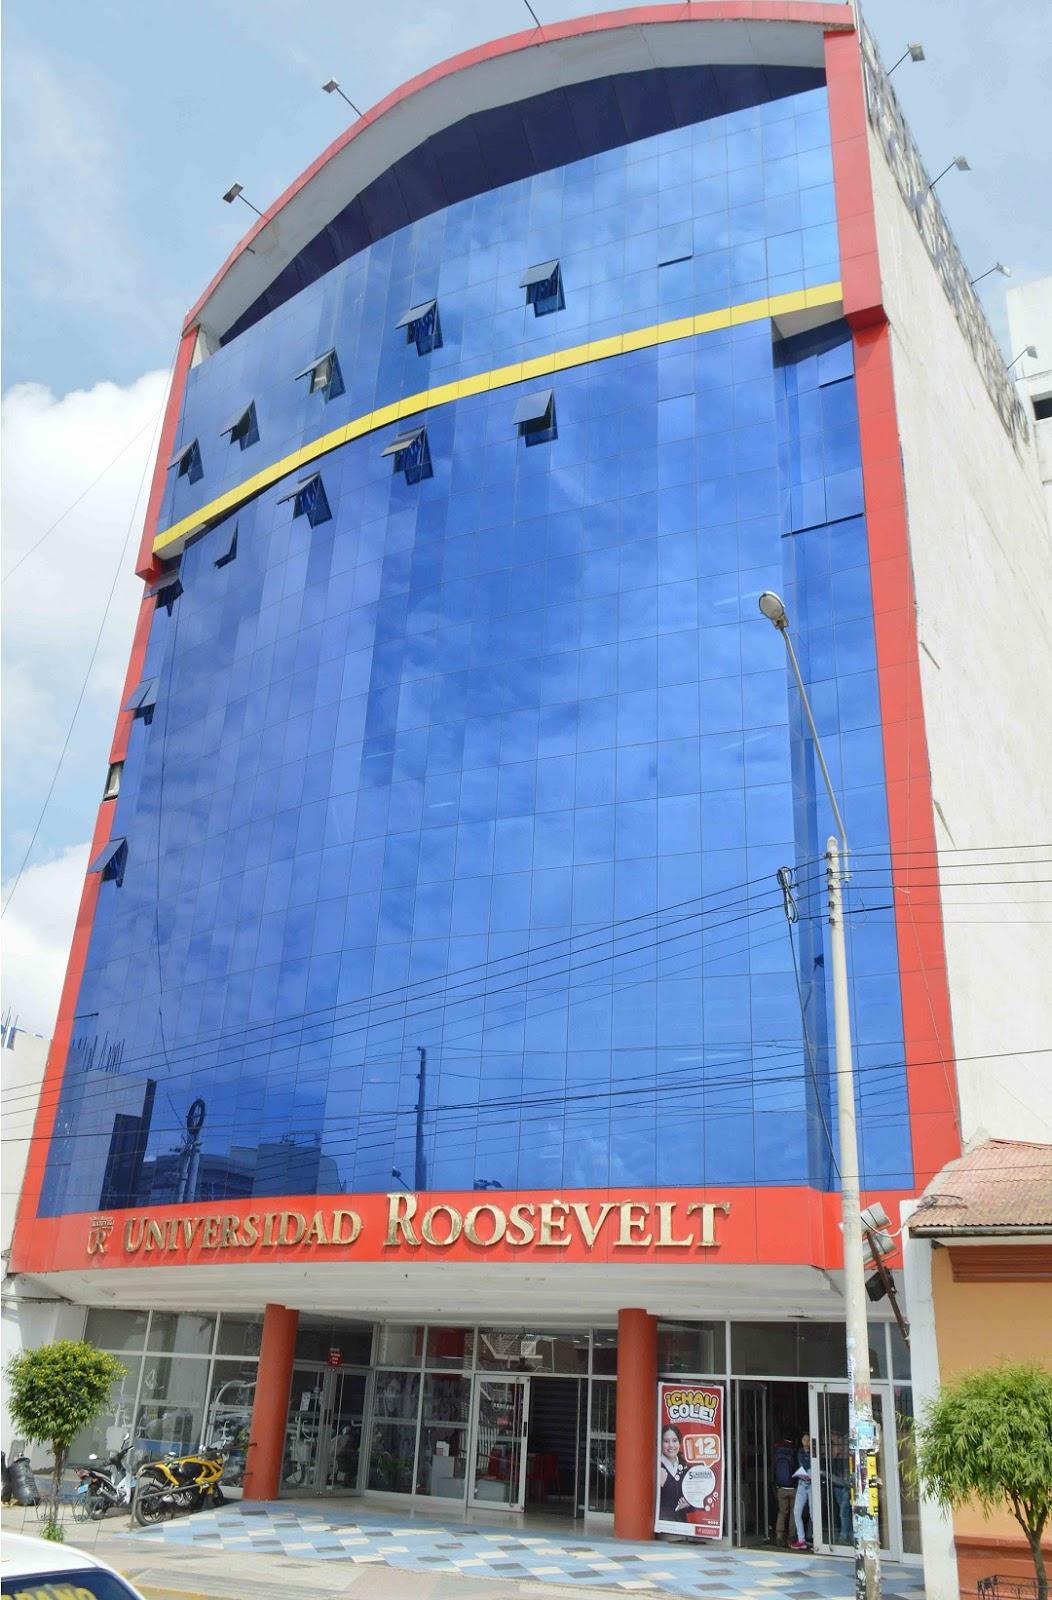 Universidad Roosevelt - UR